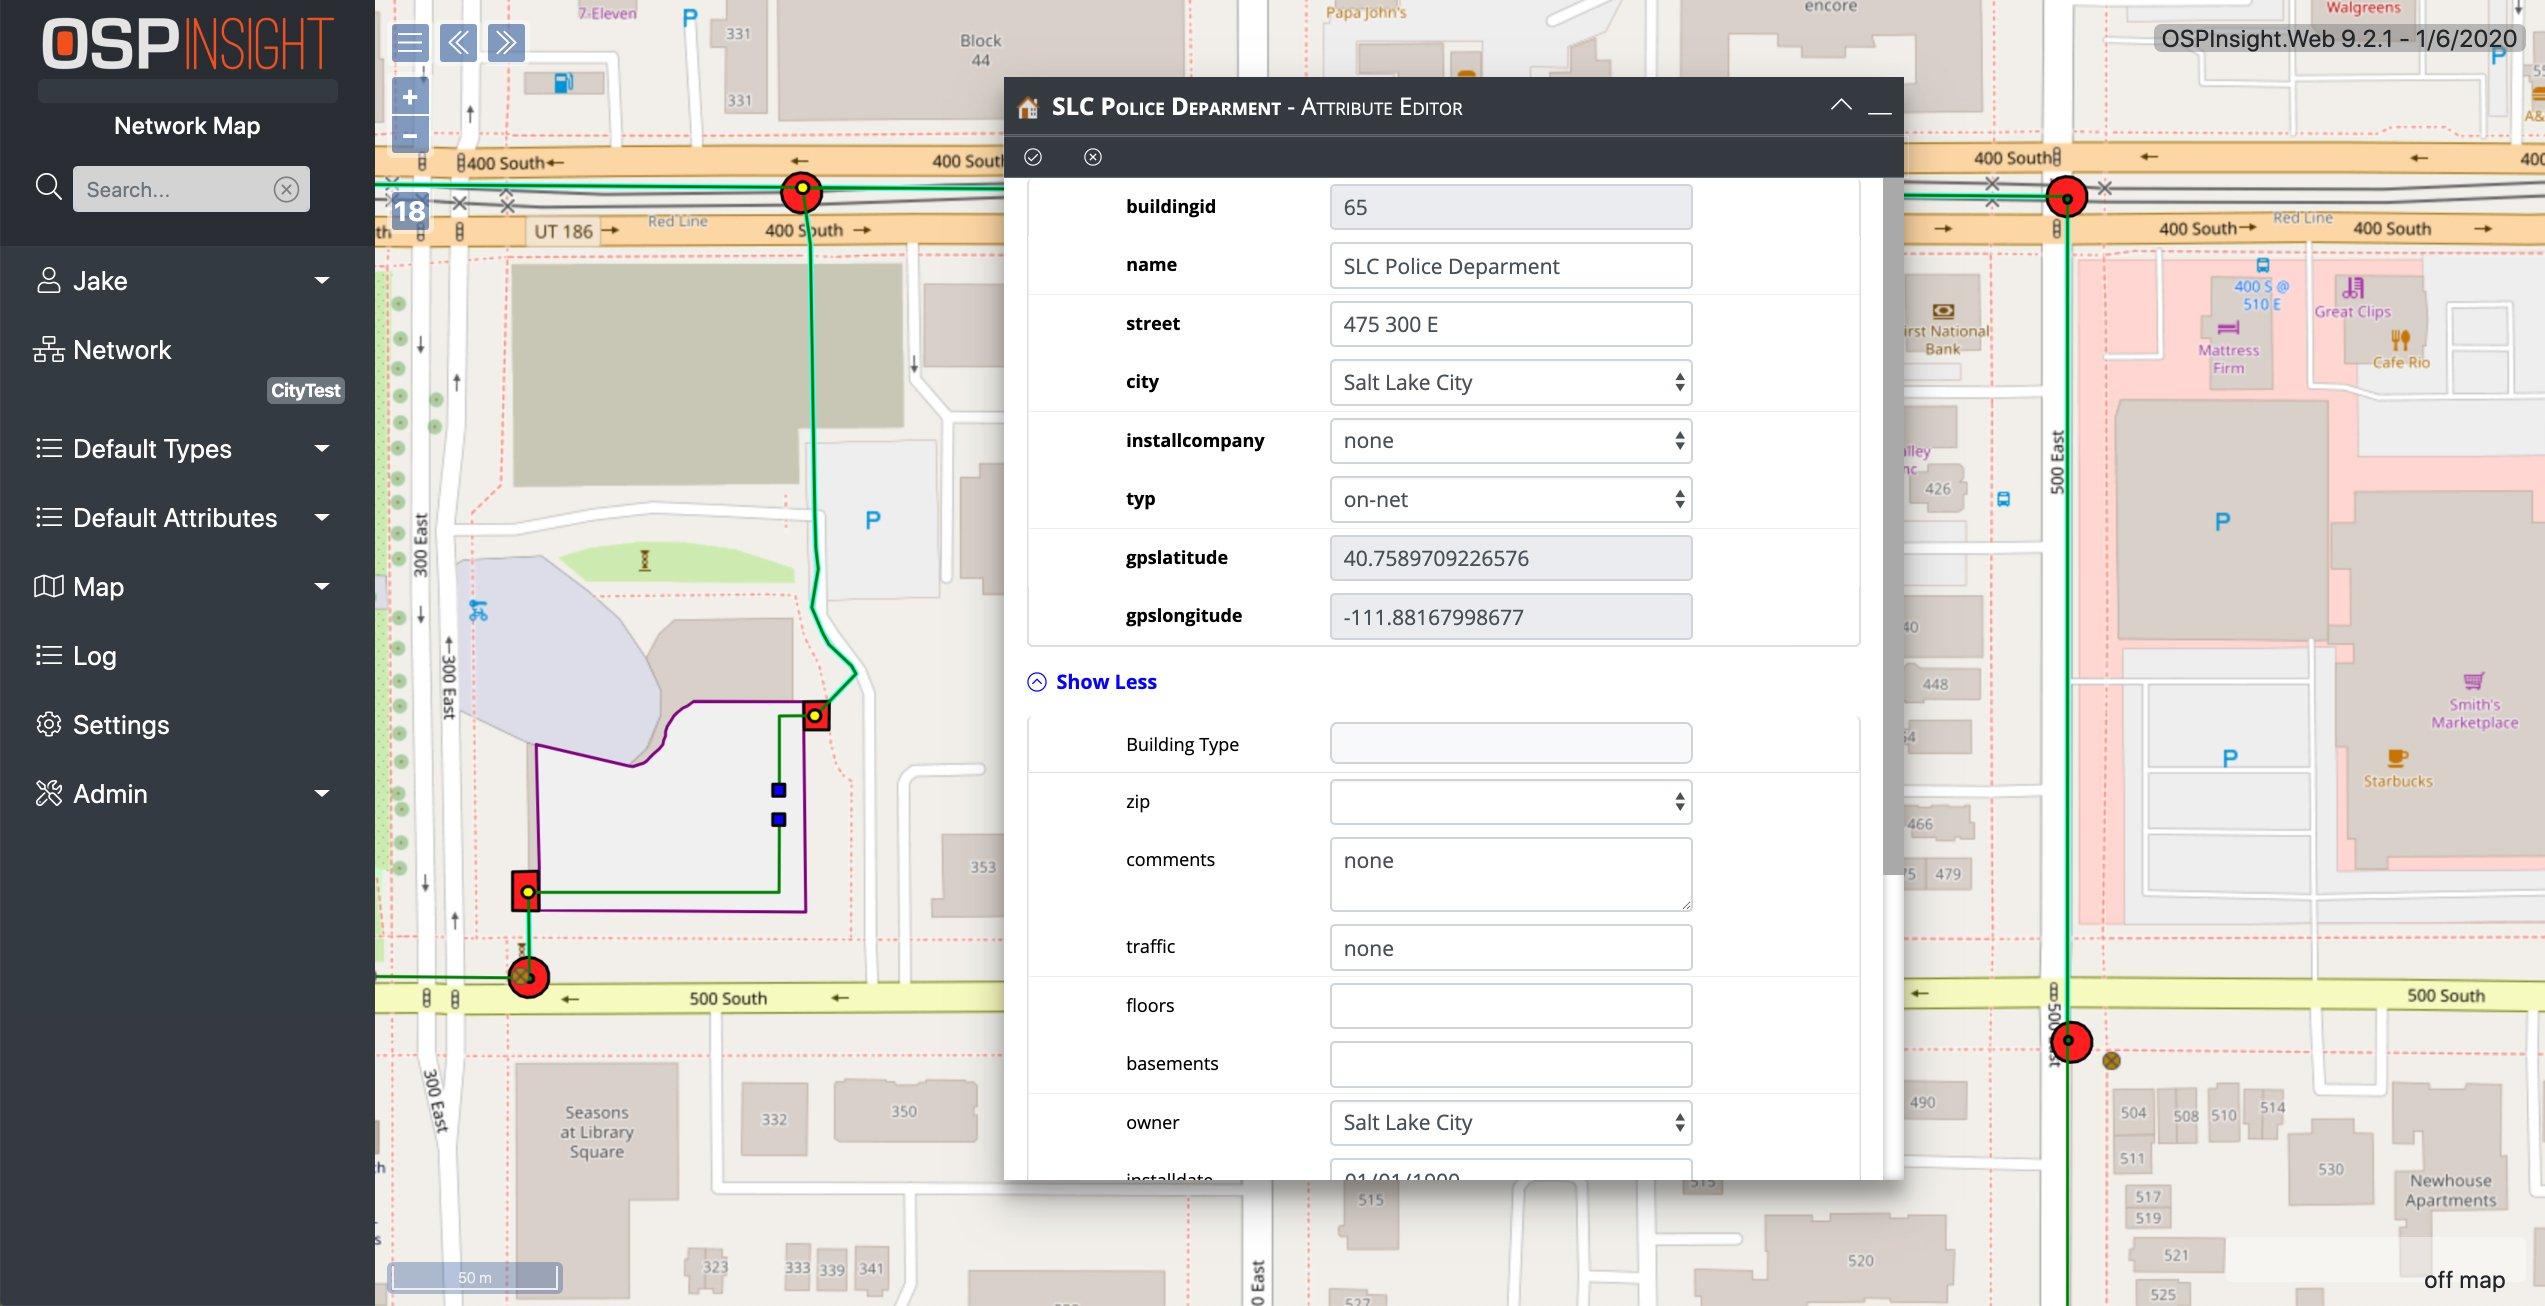 OSPInsight Web - Attribute Editor